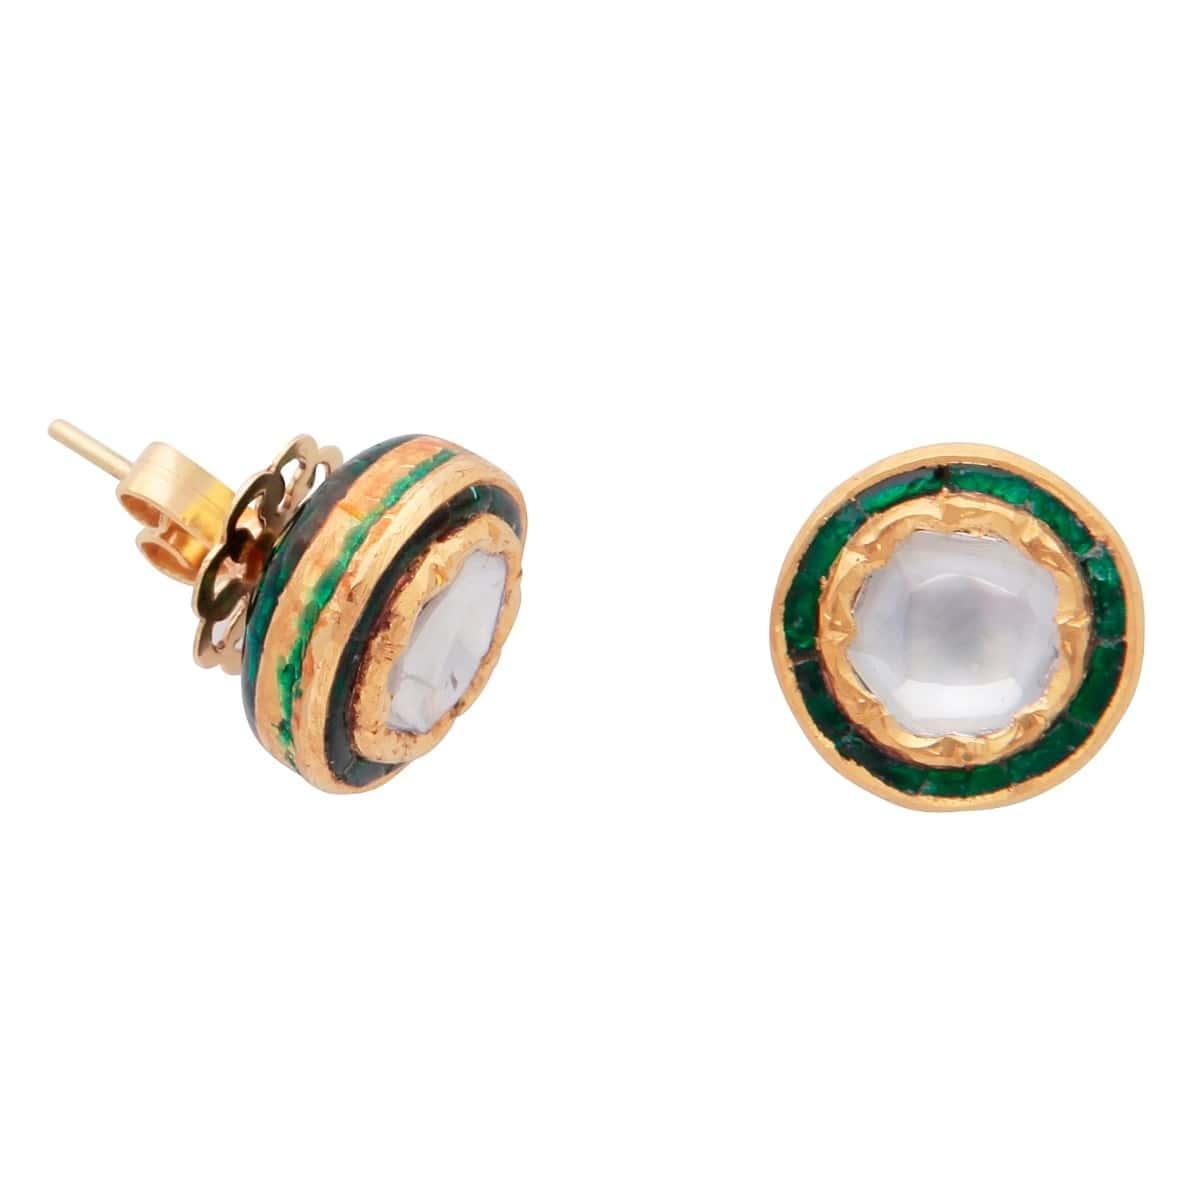 1562 'Jodha Bai' 22kt Gold Natural Diamond and Emerald Stud Earrings (round)